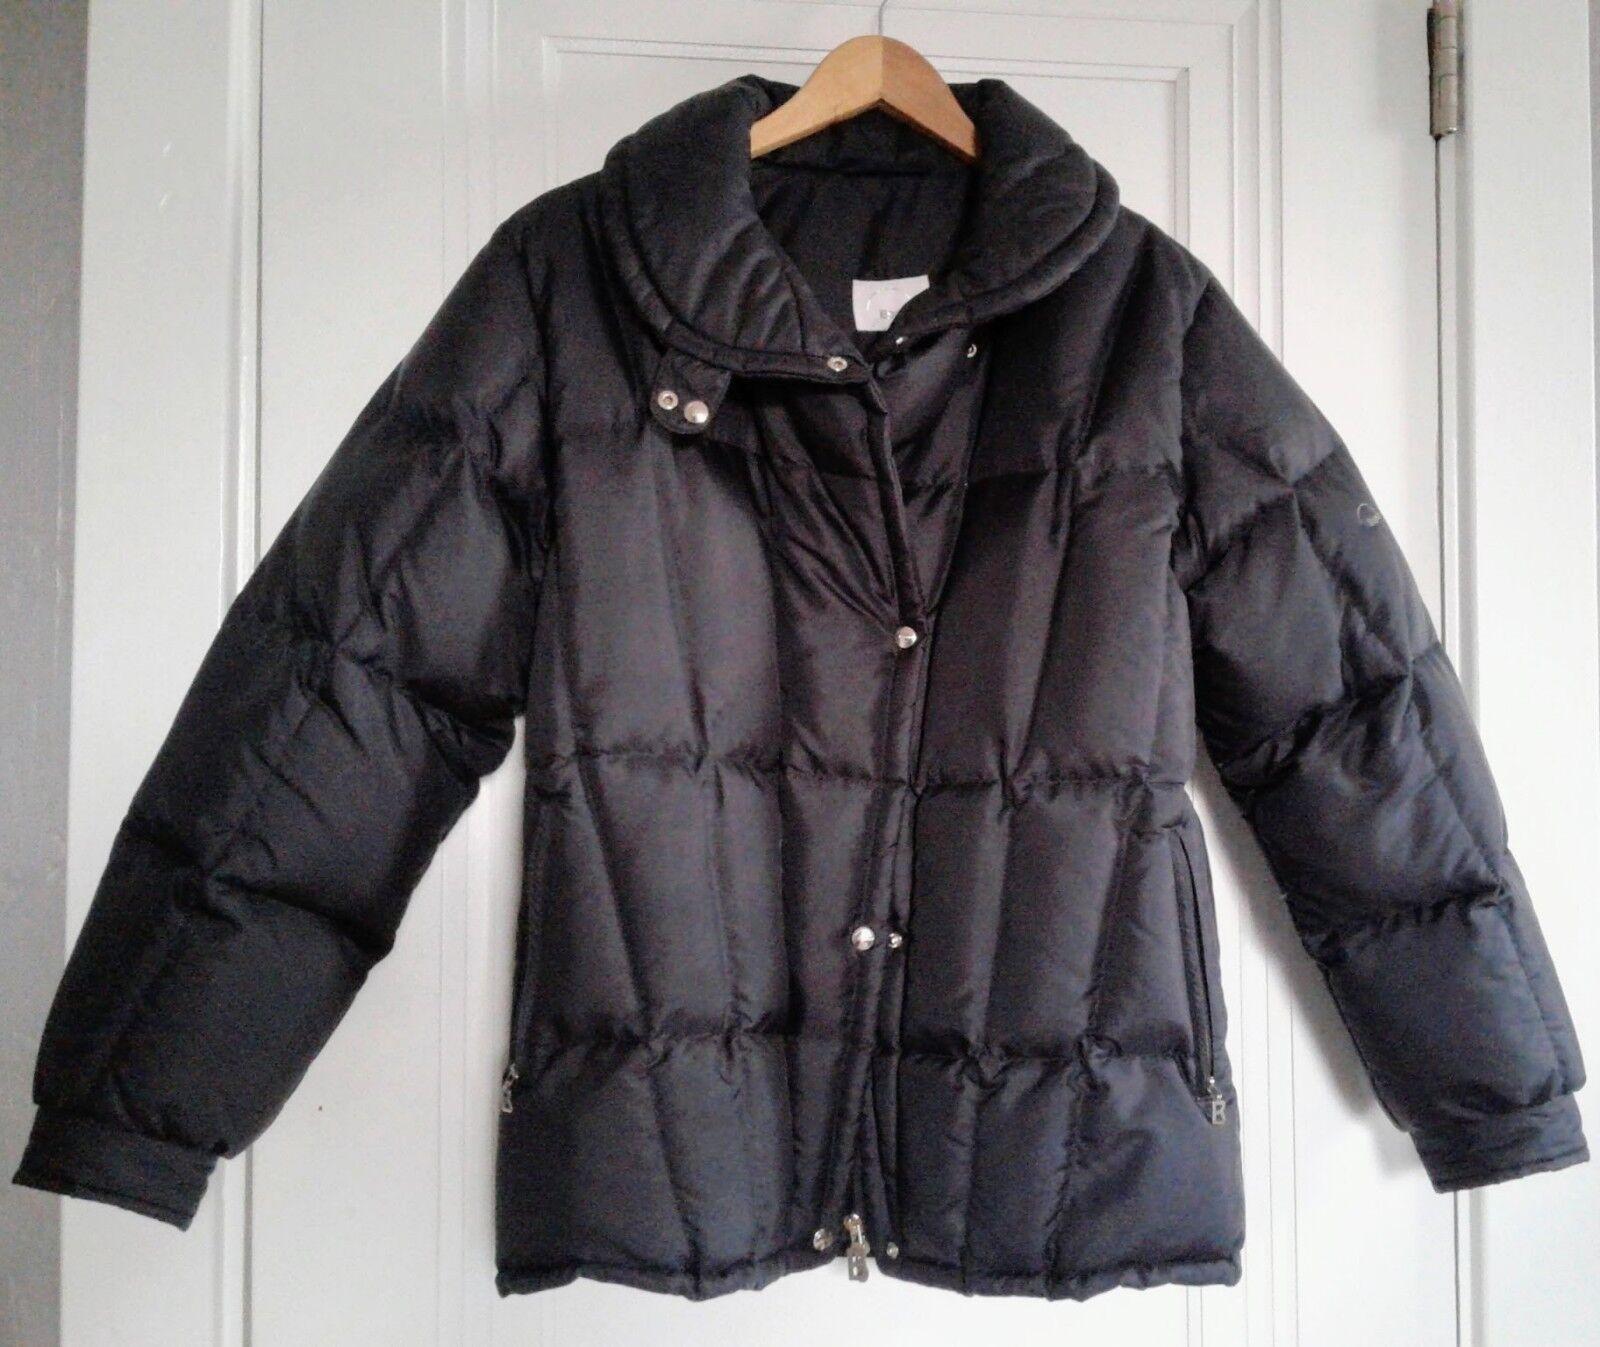 Купить Bogner - Women's BOGNER Quilted Short Puffer Jacket Black size 12, Goose Down Ski Fashion